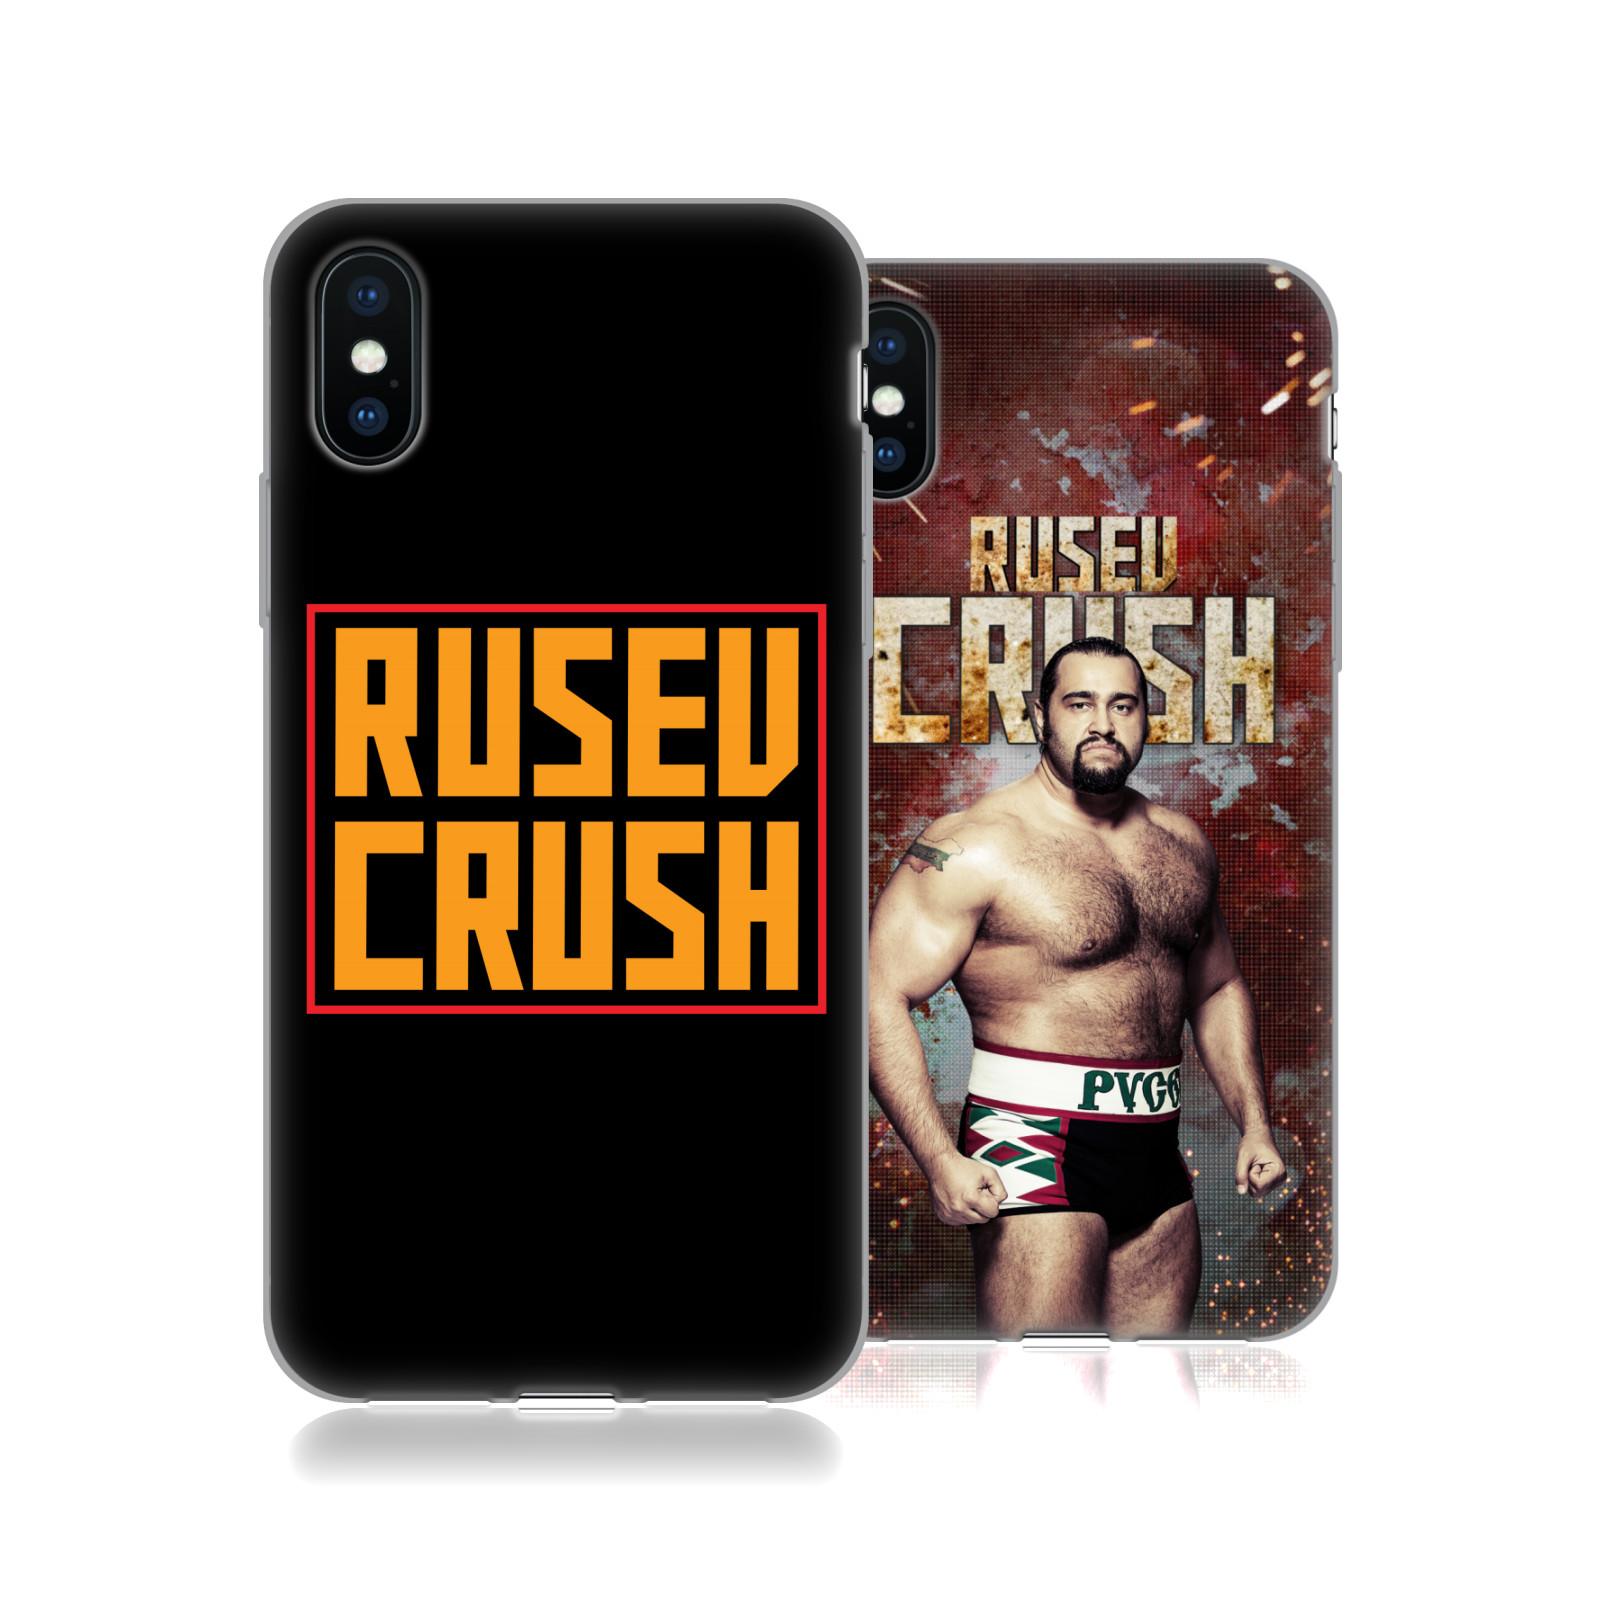 WWE Rusev Crush